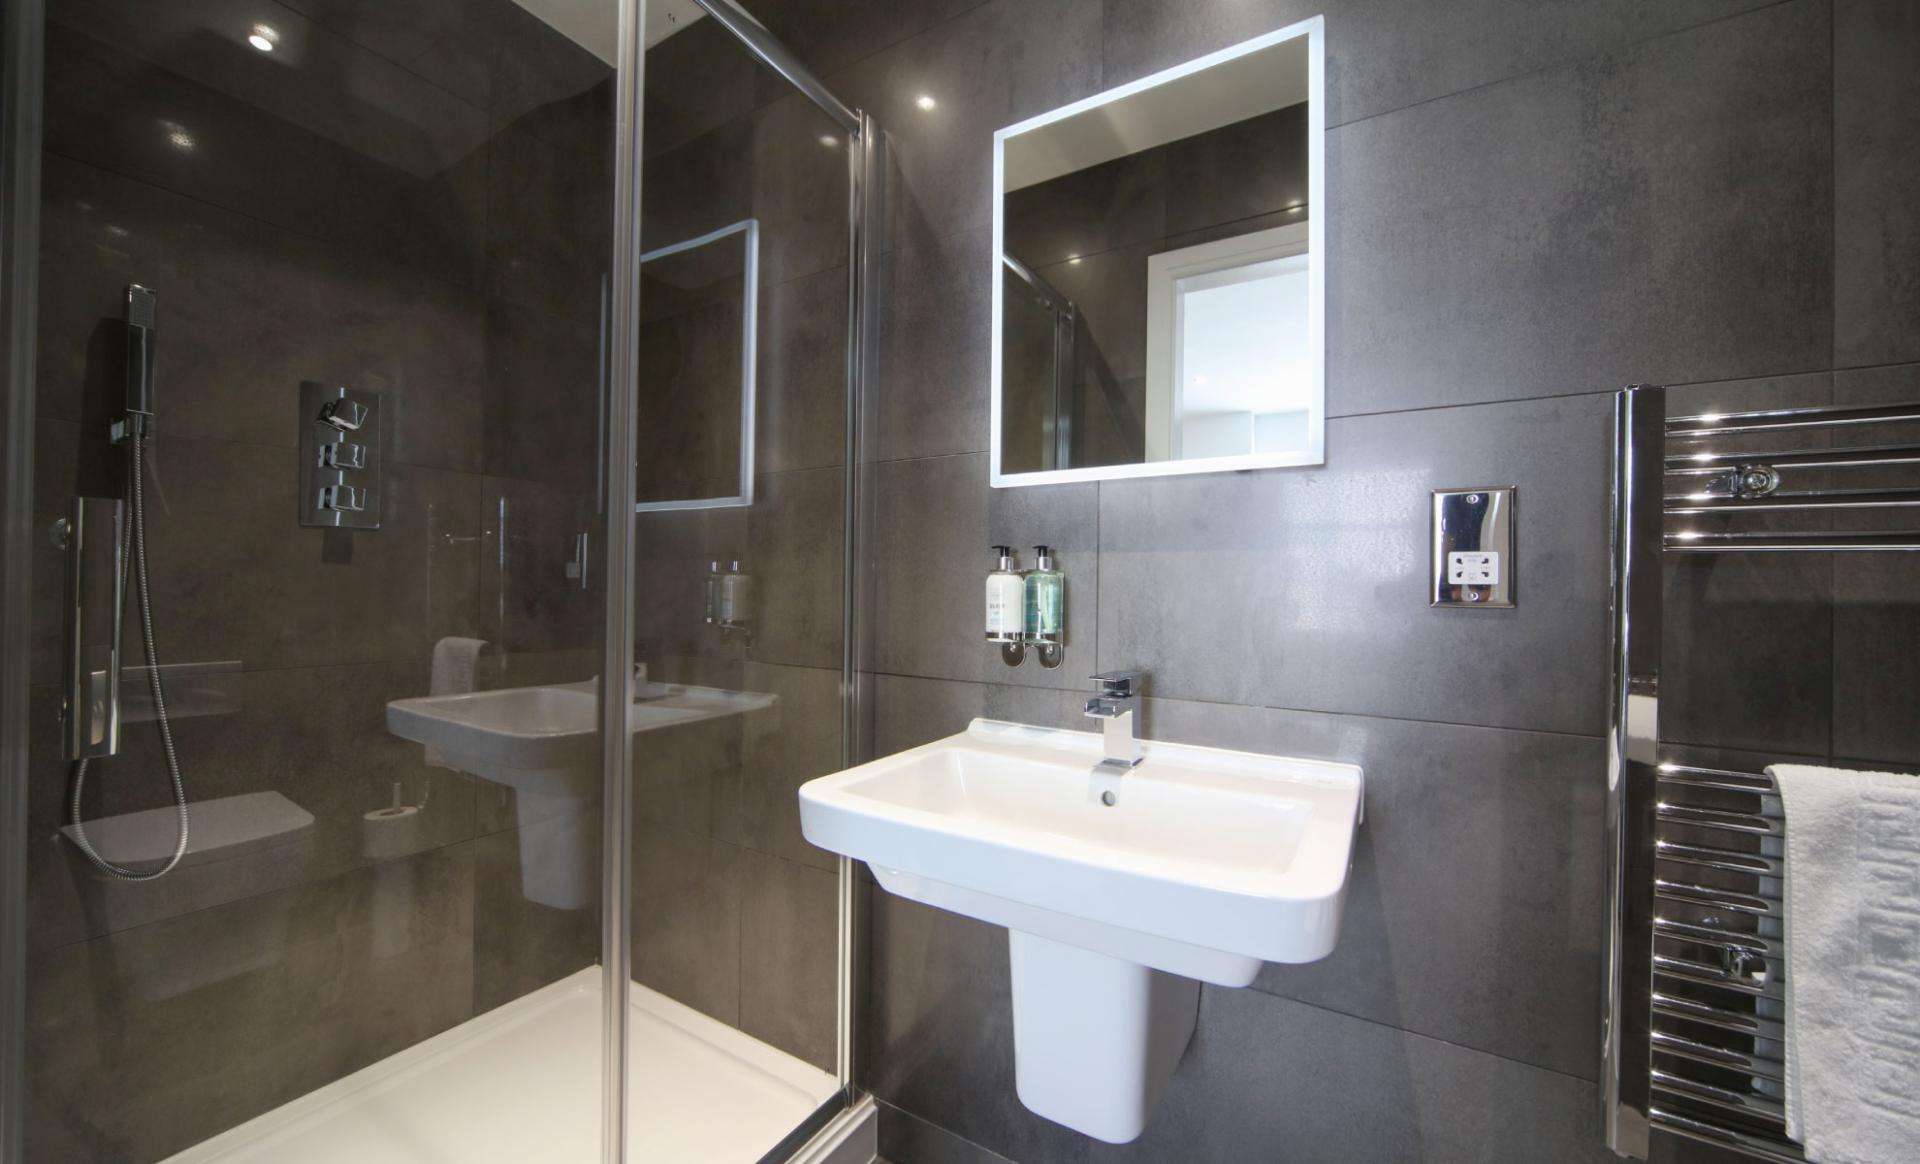 Bathroom at Citystop Apartments, Ropewalks, Liverpool - Citybase Apartments